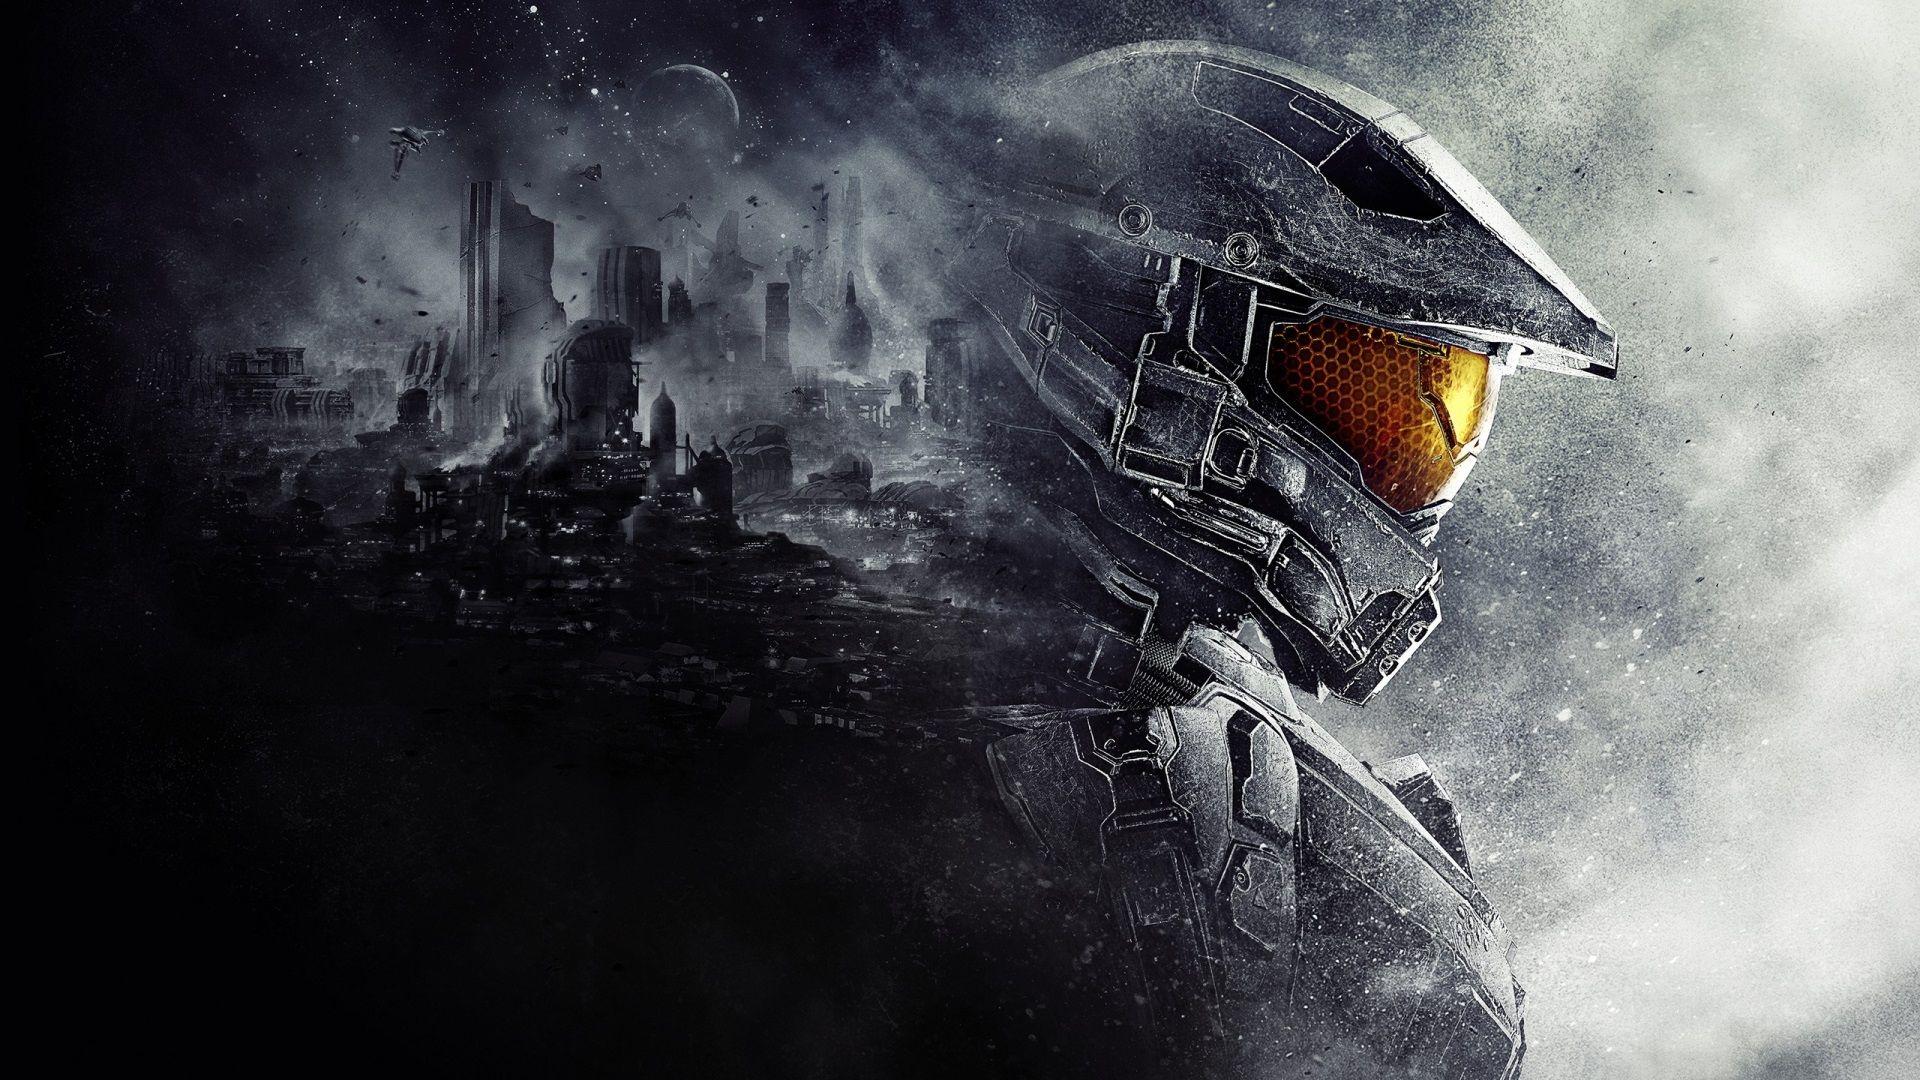 1920x1080 Halo 5 New Wallpaper In Hd Download Wallpaper Hd Chiefs Wallpaper Halo